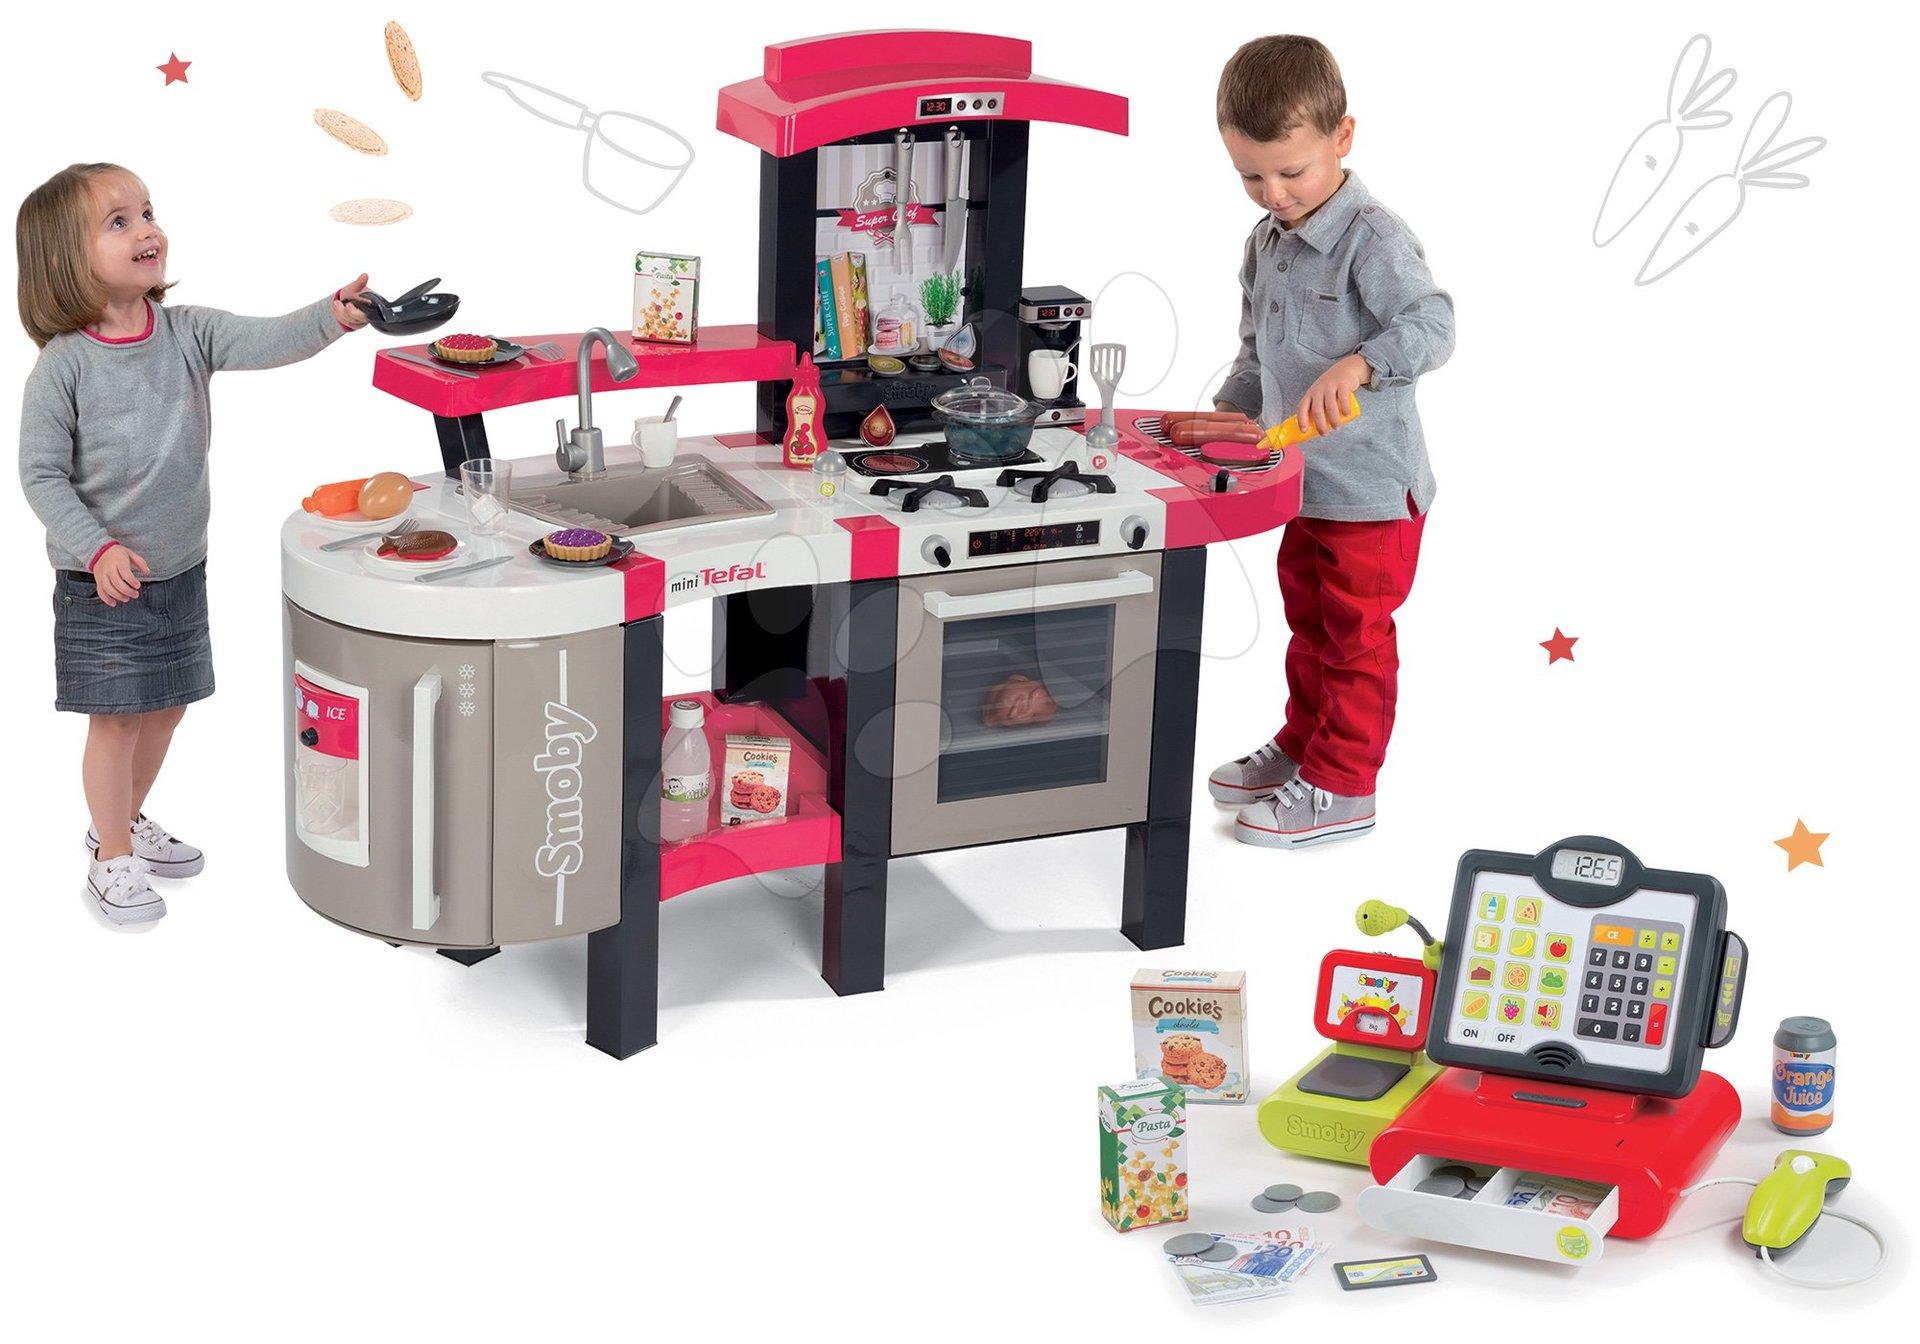 Kuchynky pre deti sety - Set kuchynka Tefal SuperChef Smoby s grilom a kávovarom a elektronická dotyková pokladňa